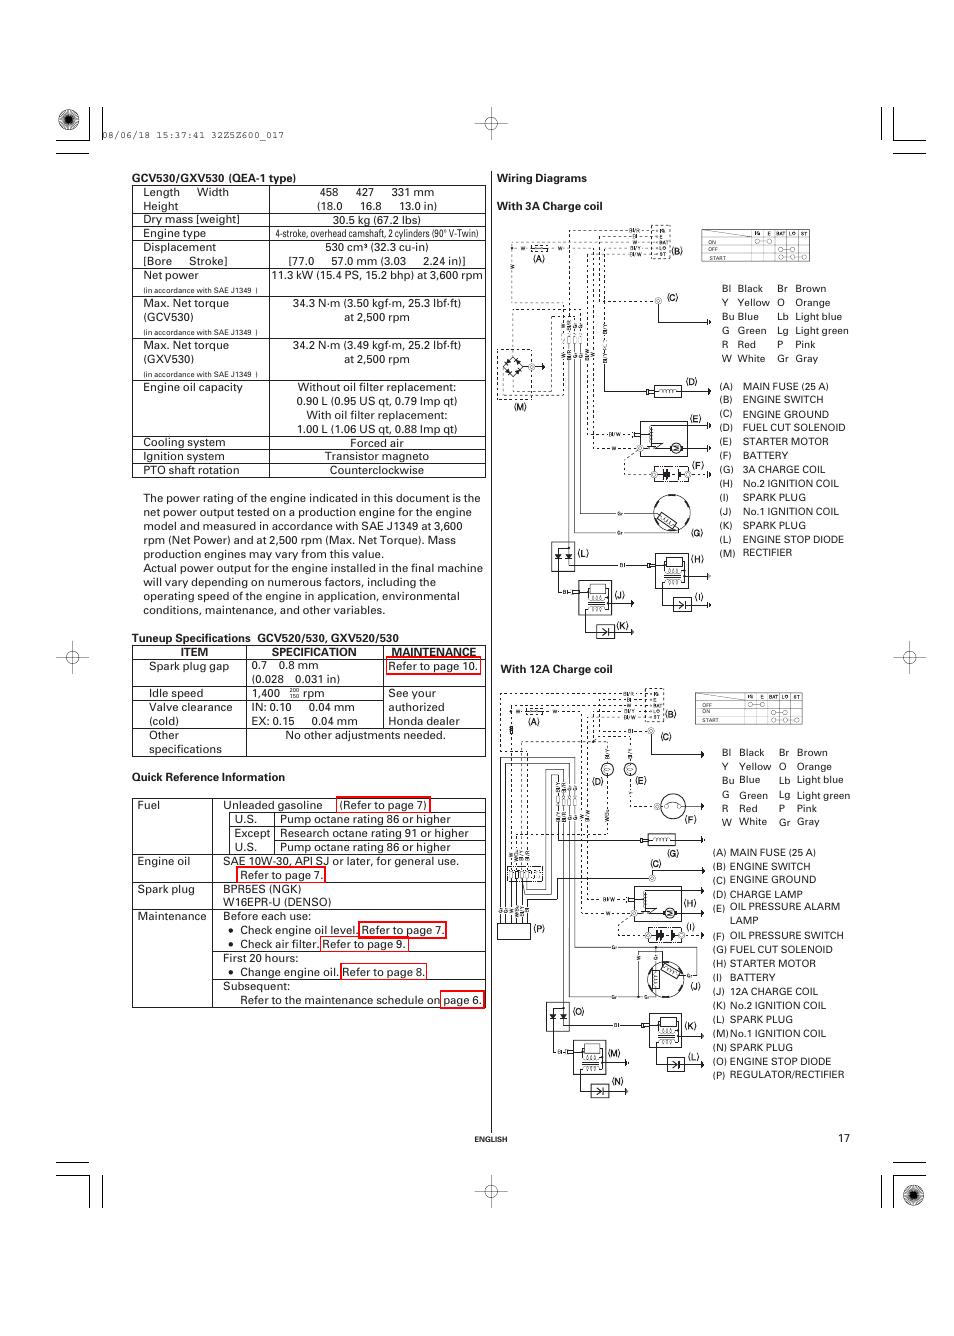 Honda Gx340 Manual Carburetor Ebook Prospeed Sx Series Klx Dt150 Non Power Bomb Red Full Array Rh Pureroseo